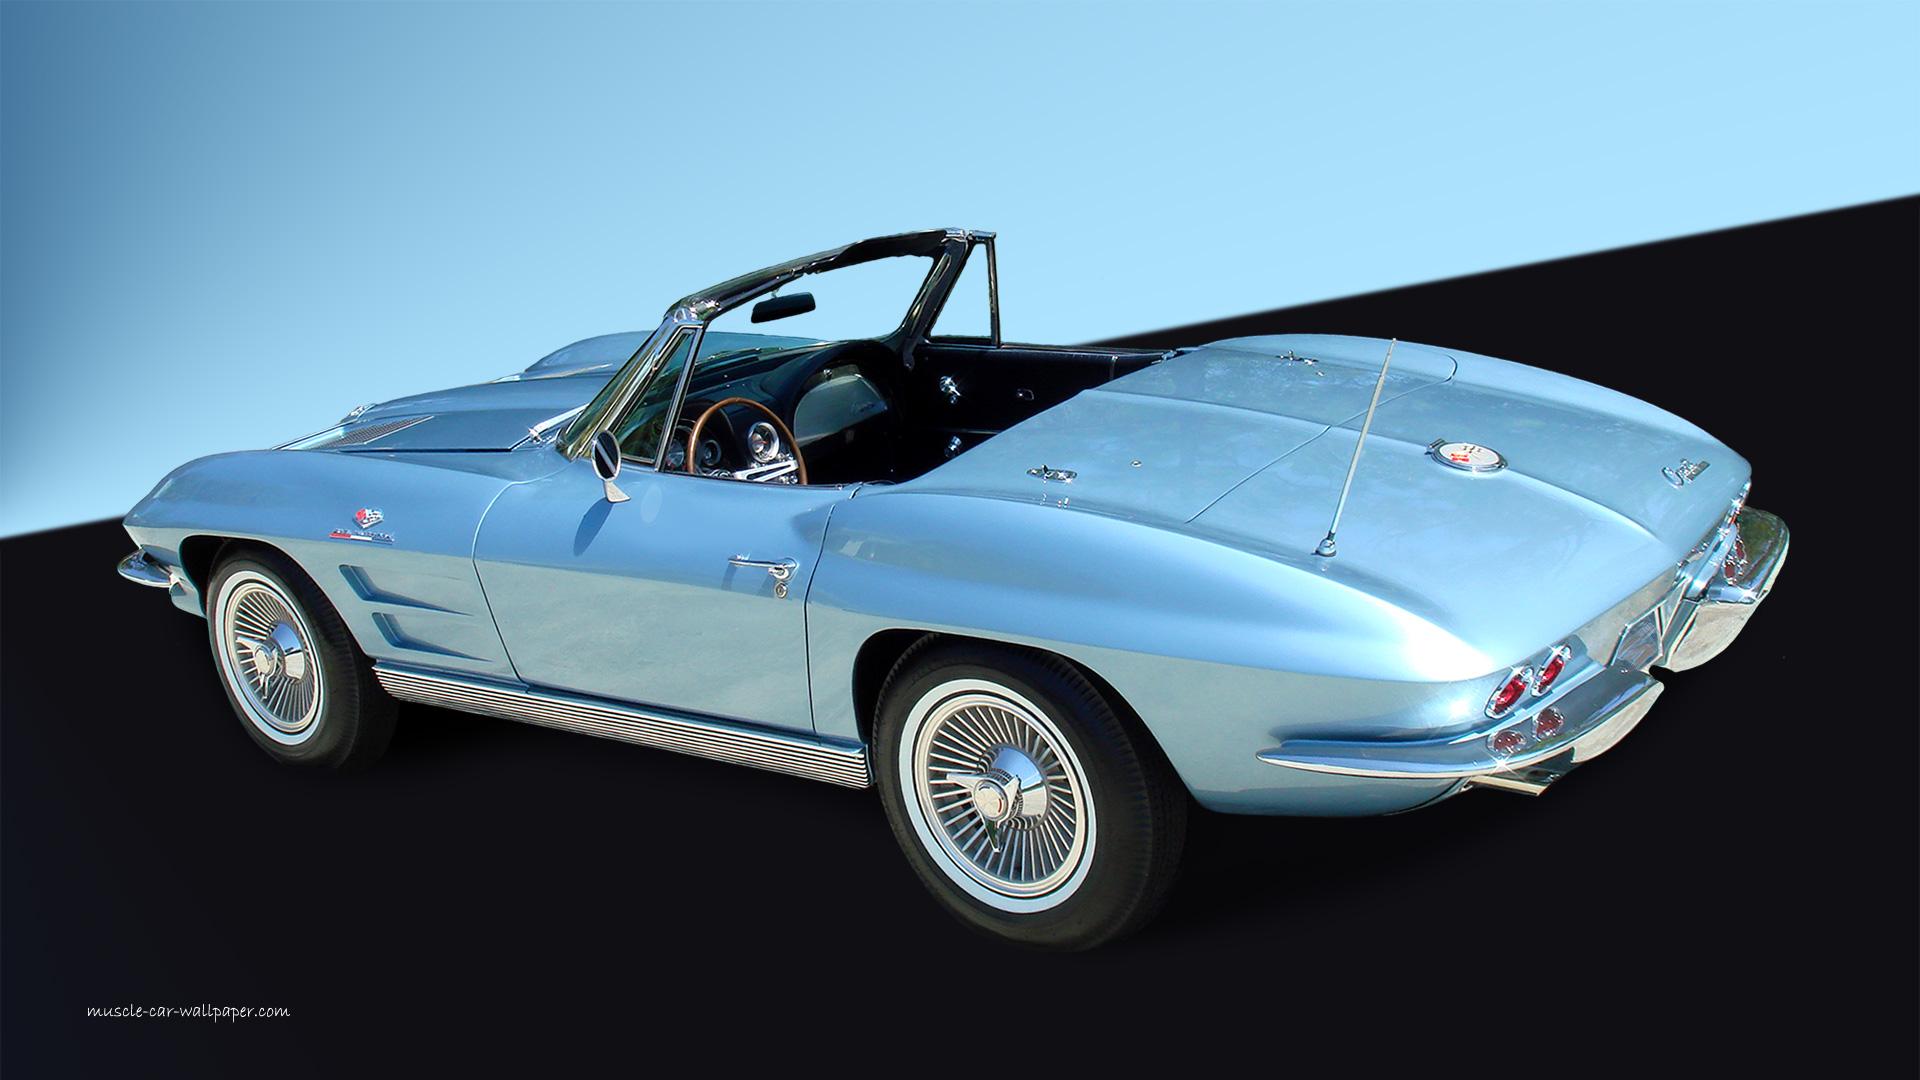 Corvette Wallpaper - 1963 Corvette Convertible | 1920x1080_01